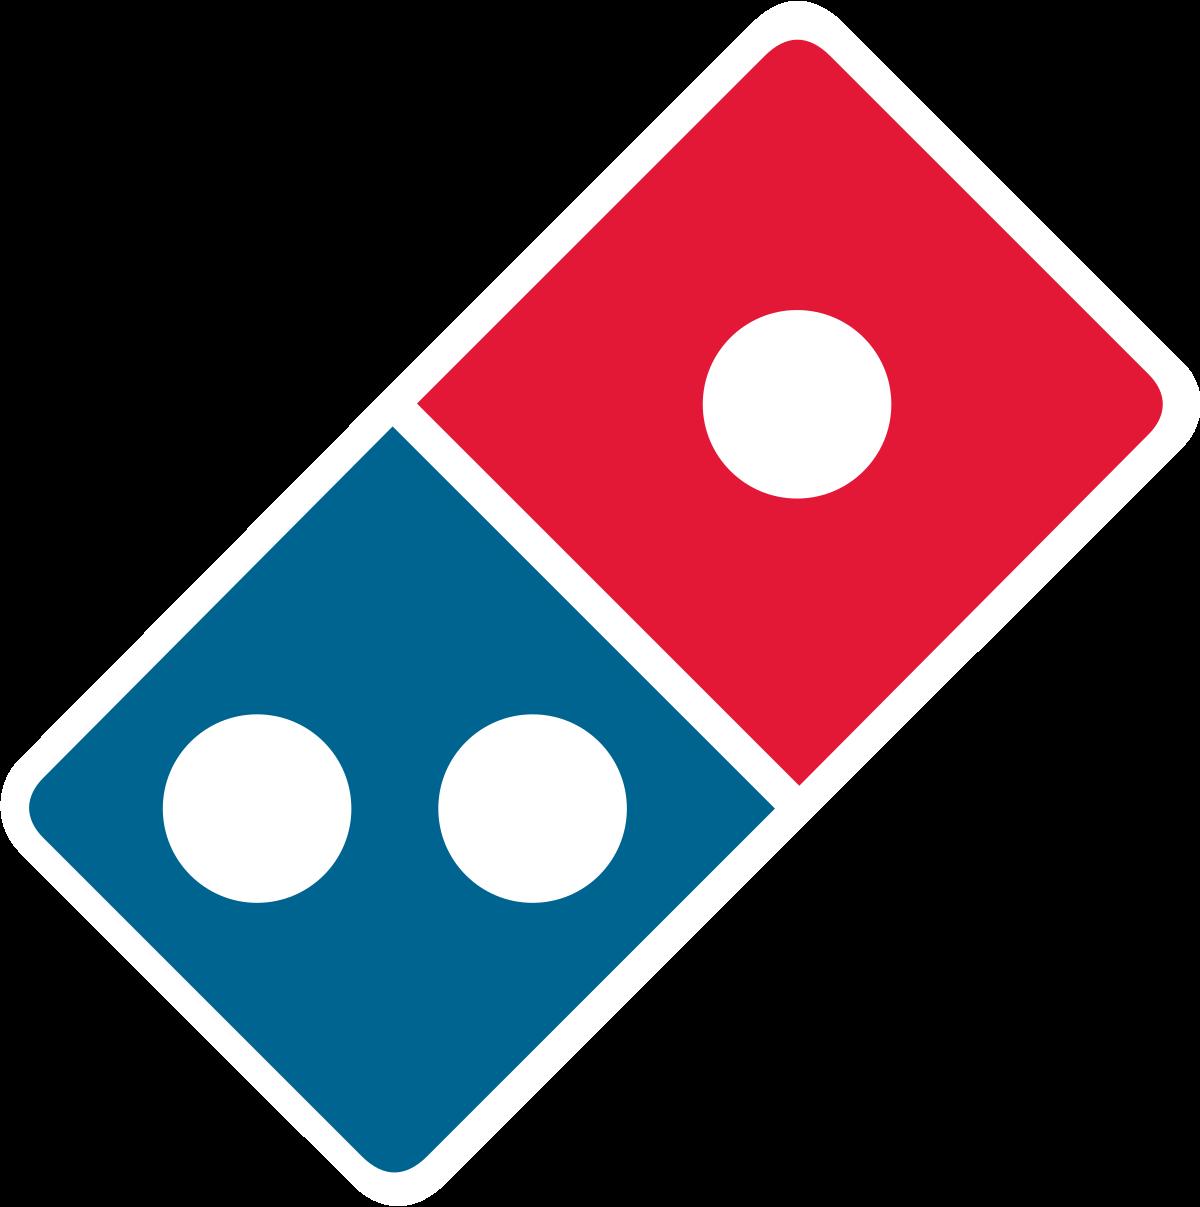 picture black and white stock S pizza wikipedia . Domino clipart background